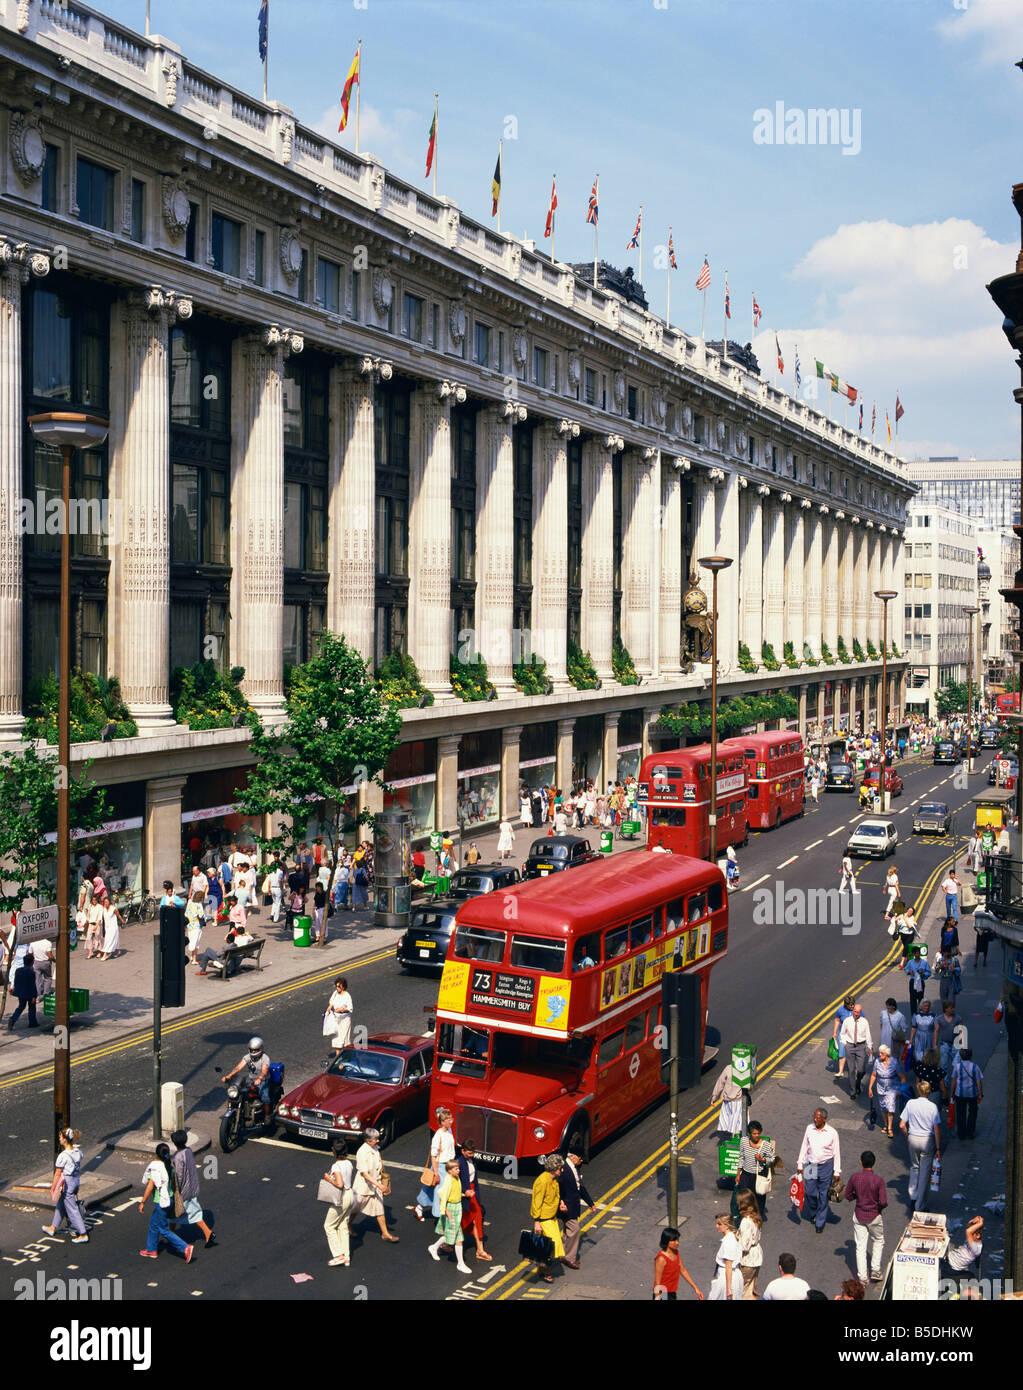 Selfridges department store and London bus on Oxford Street London England UK W Rawlings - Stock Image